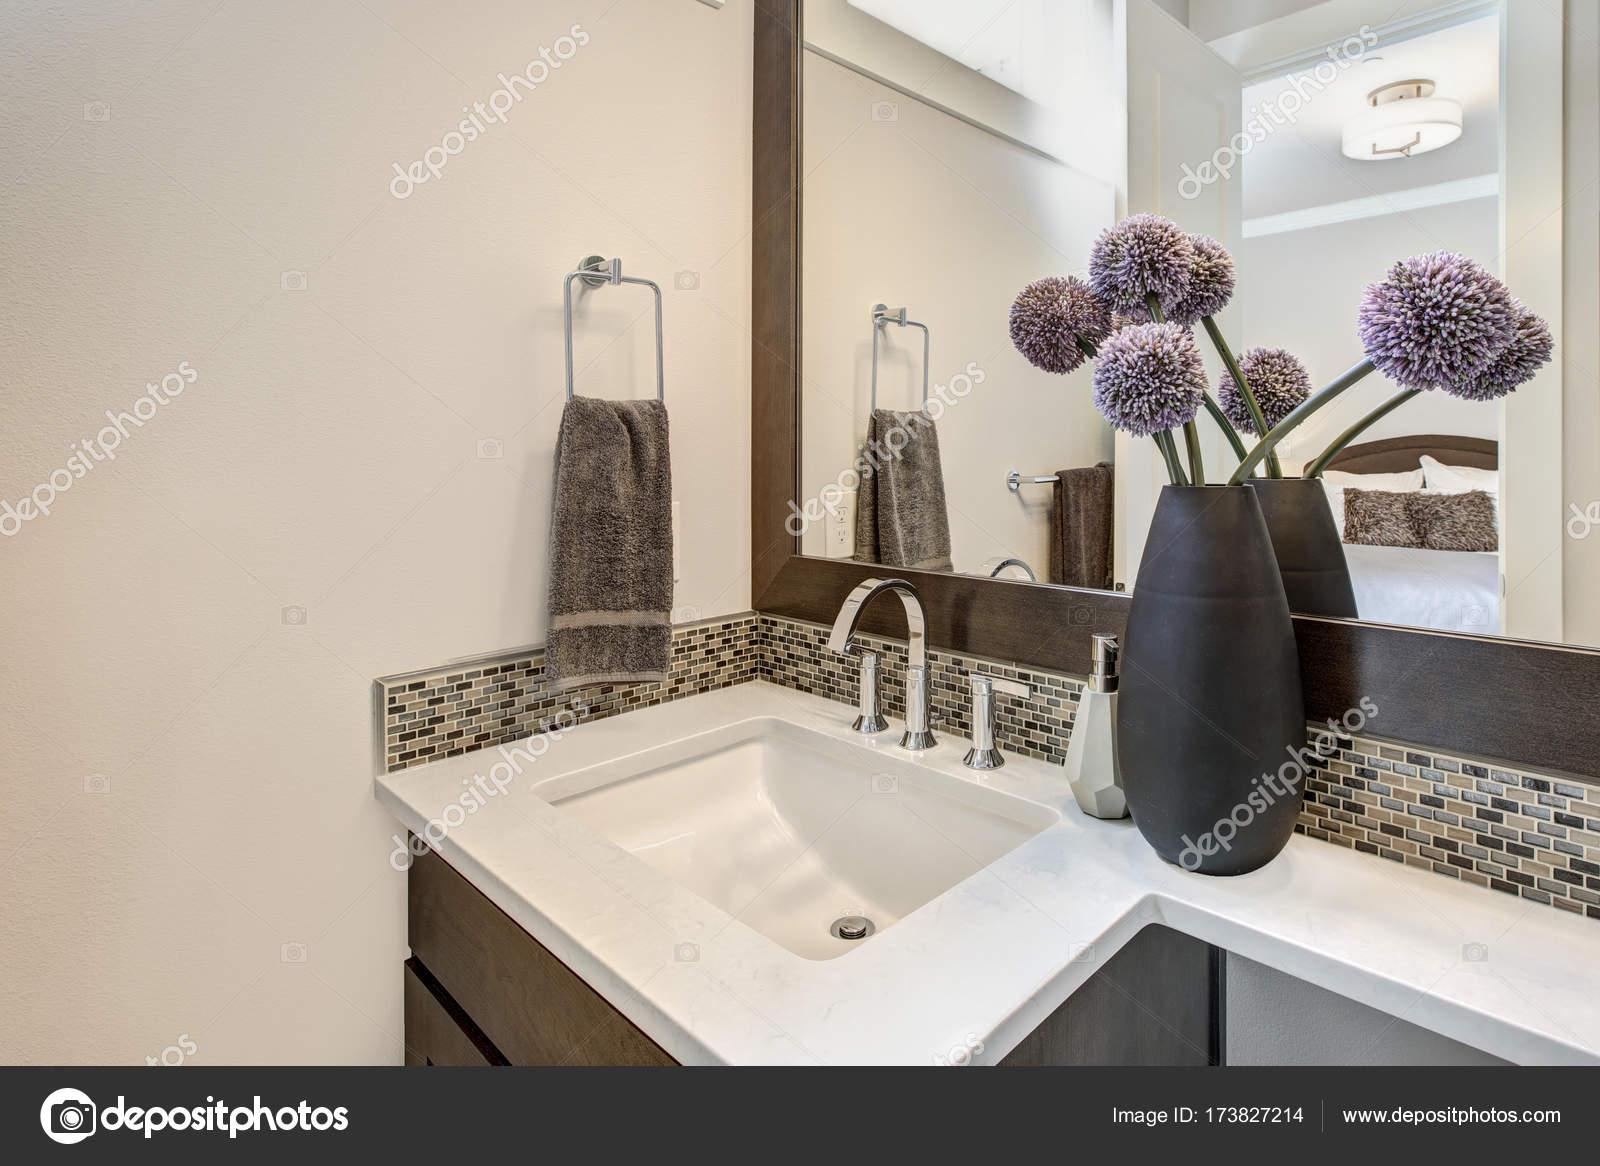 Rechthoekige Witte Wastafel : Witte en bruine badkamer interieur met ijdelheid kabinet